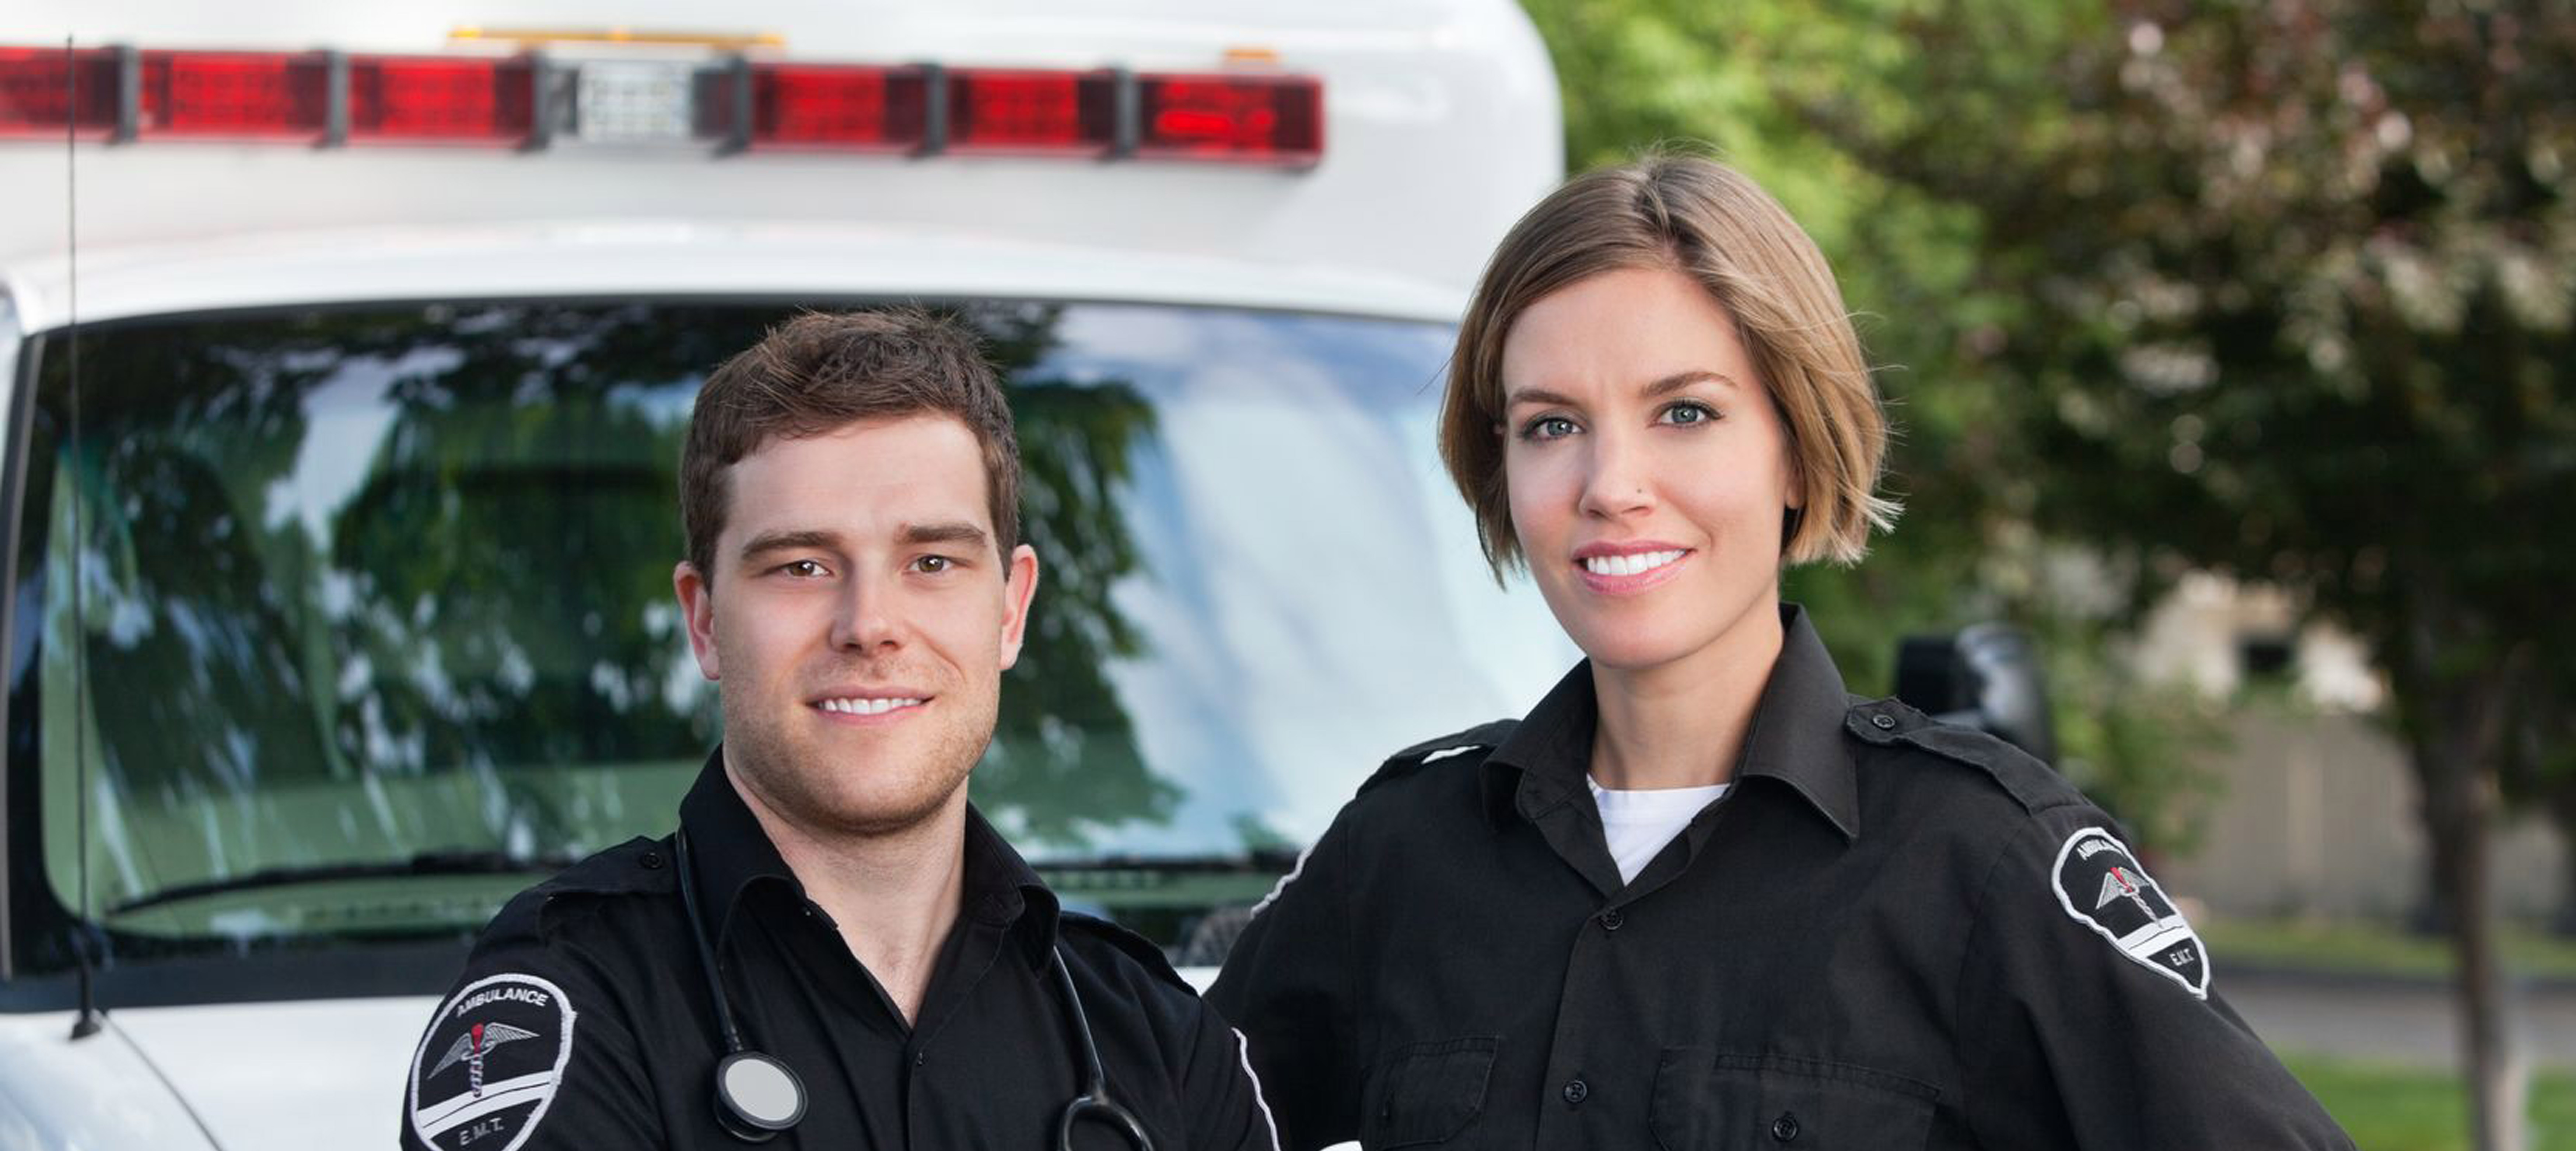 HCI-slider-paramedics